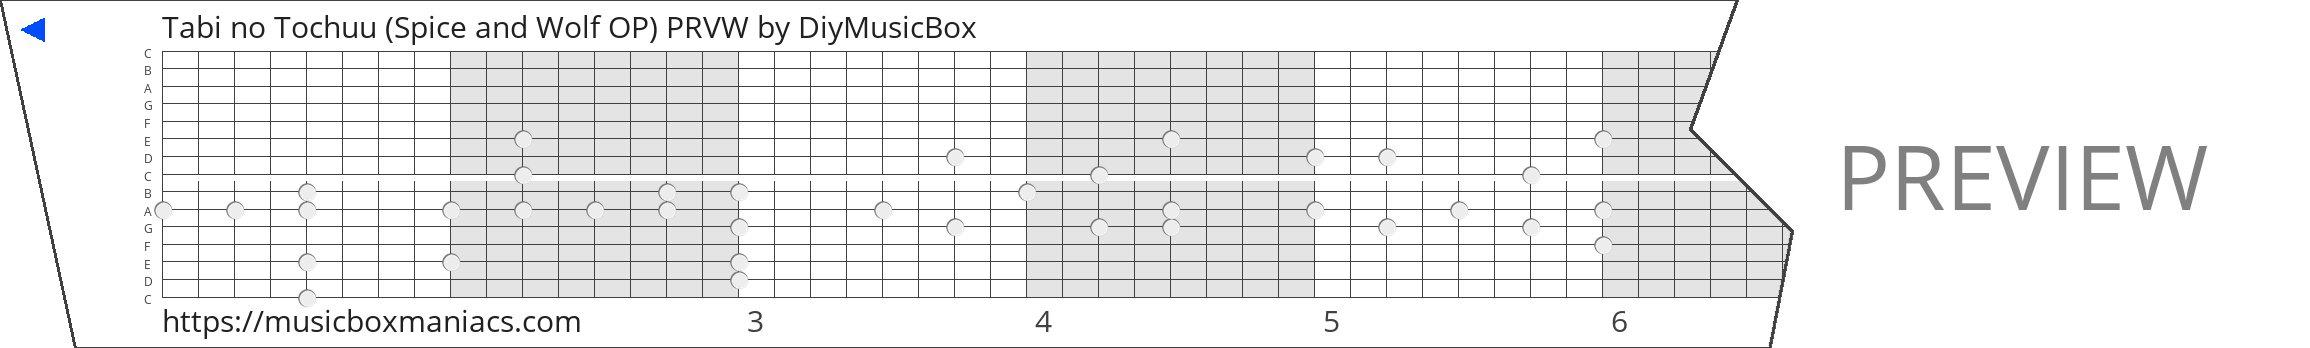 Tabi no Tochuu (Spice and Wolf OP) PRVW 15 note music box paper strip